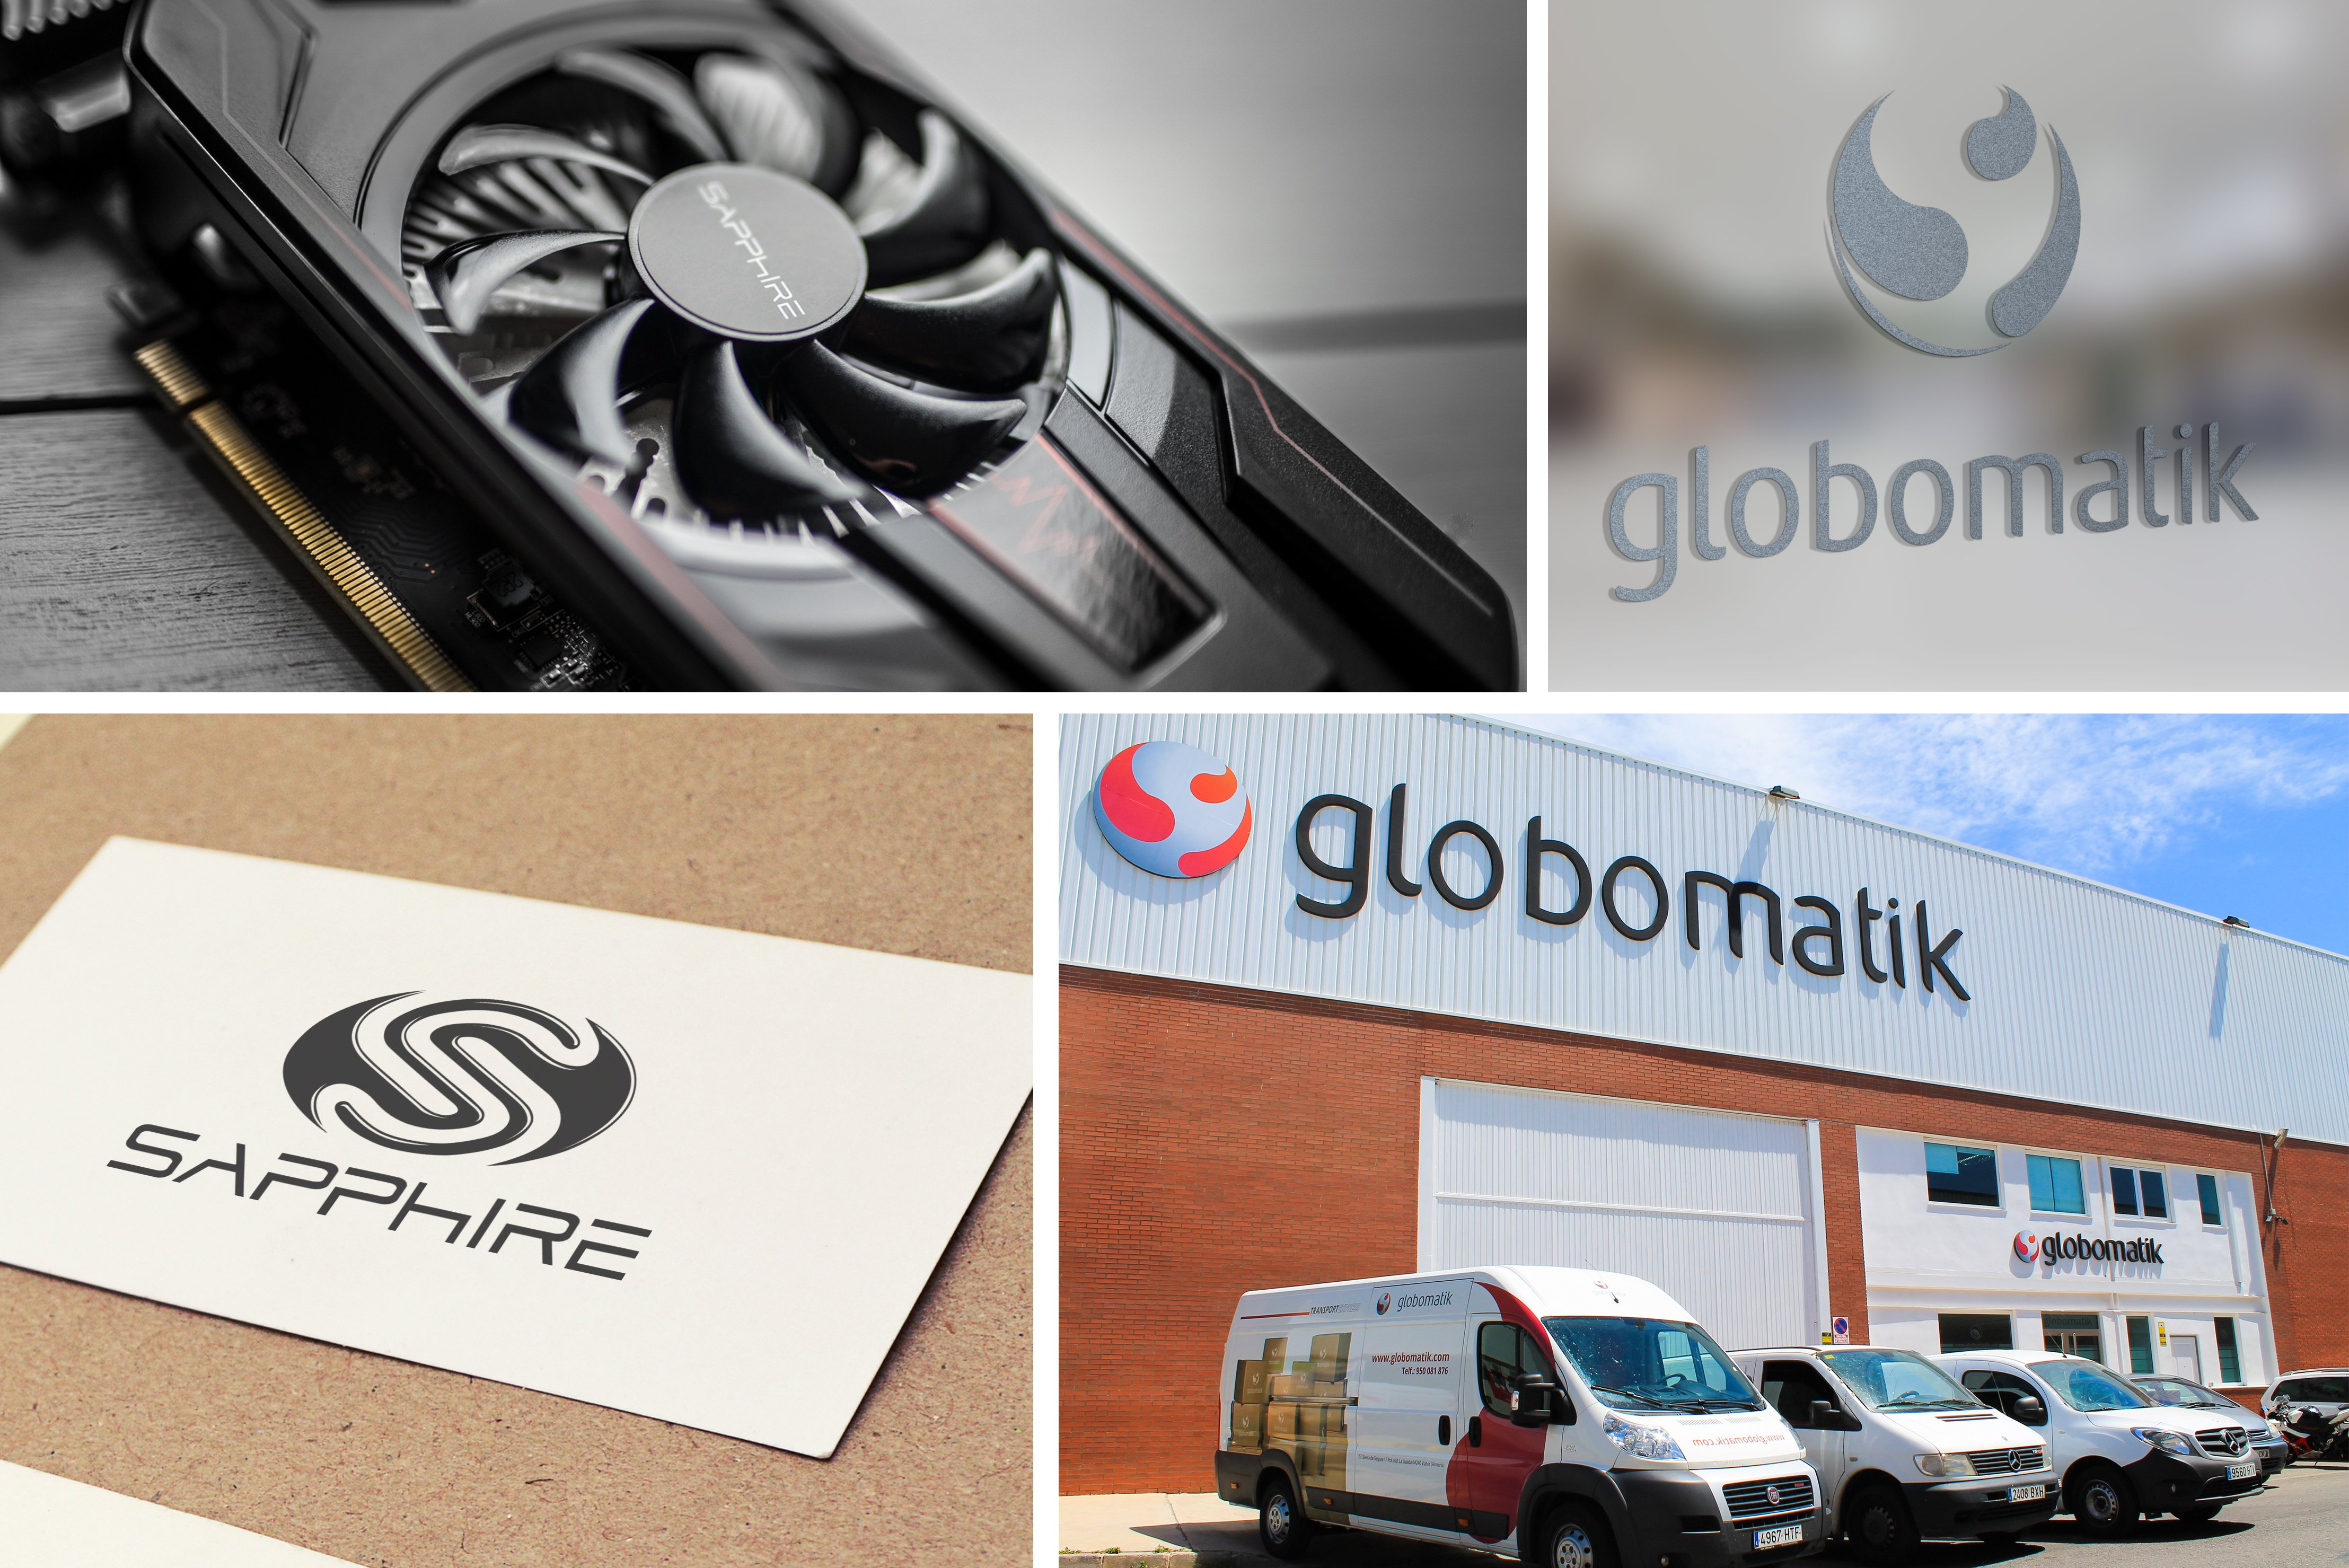 Globomatik distribuidor oficial de Sapphire en Iberia